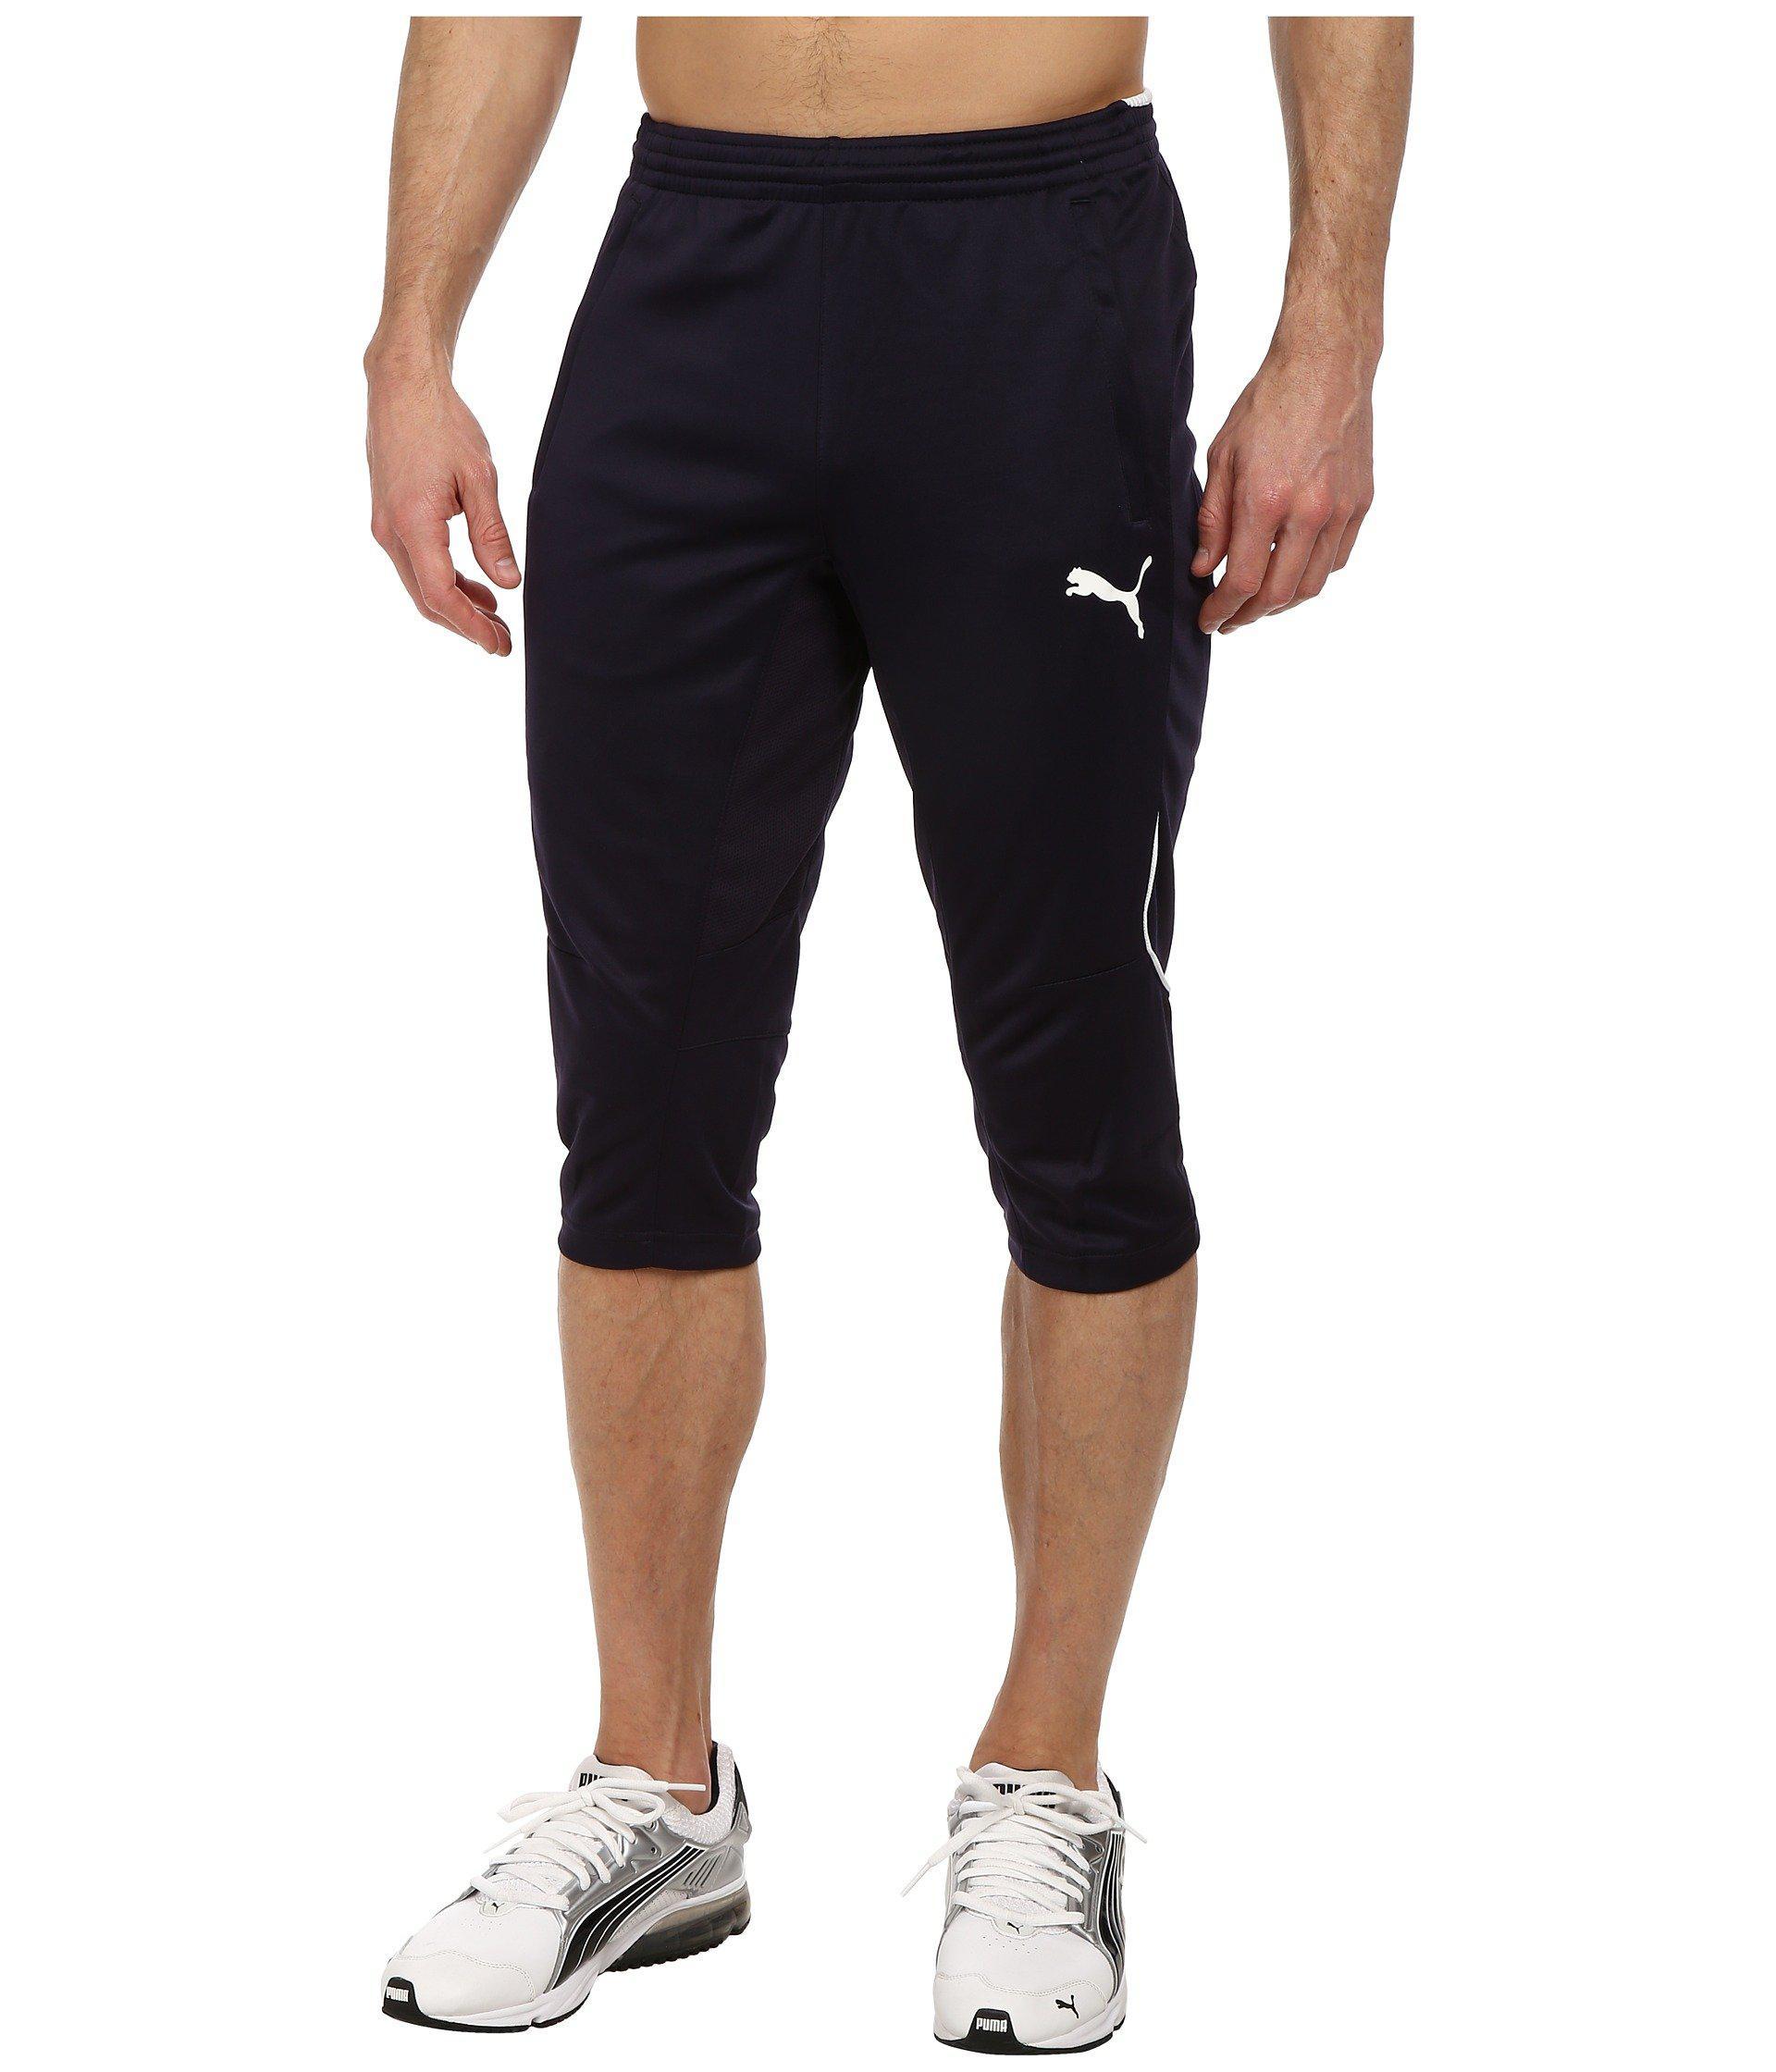 PUMA Synthetic 3/4 Training Pant (black/white) Men's Casual Pants ...